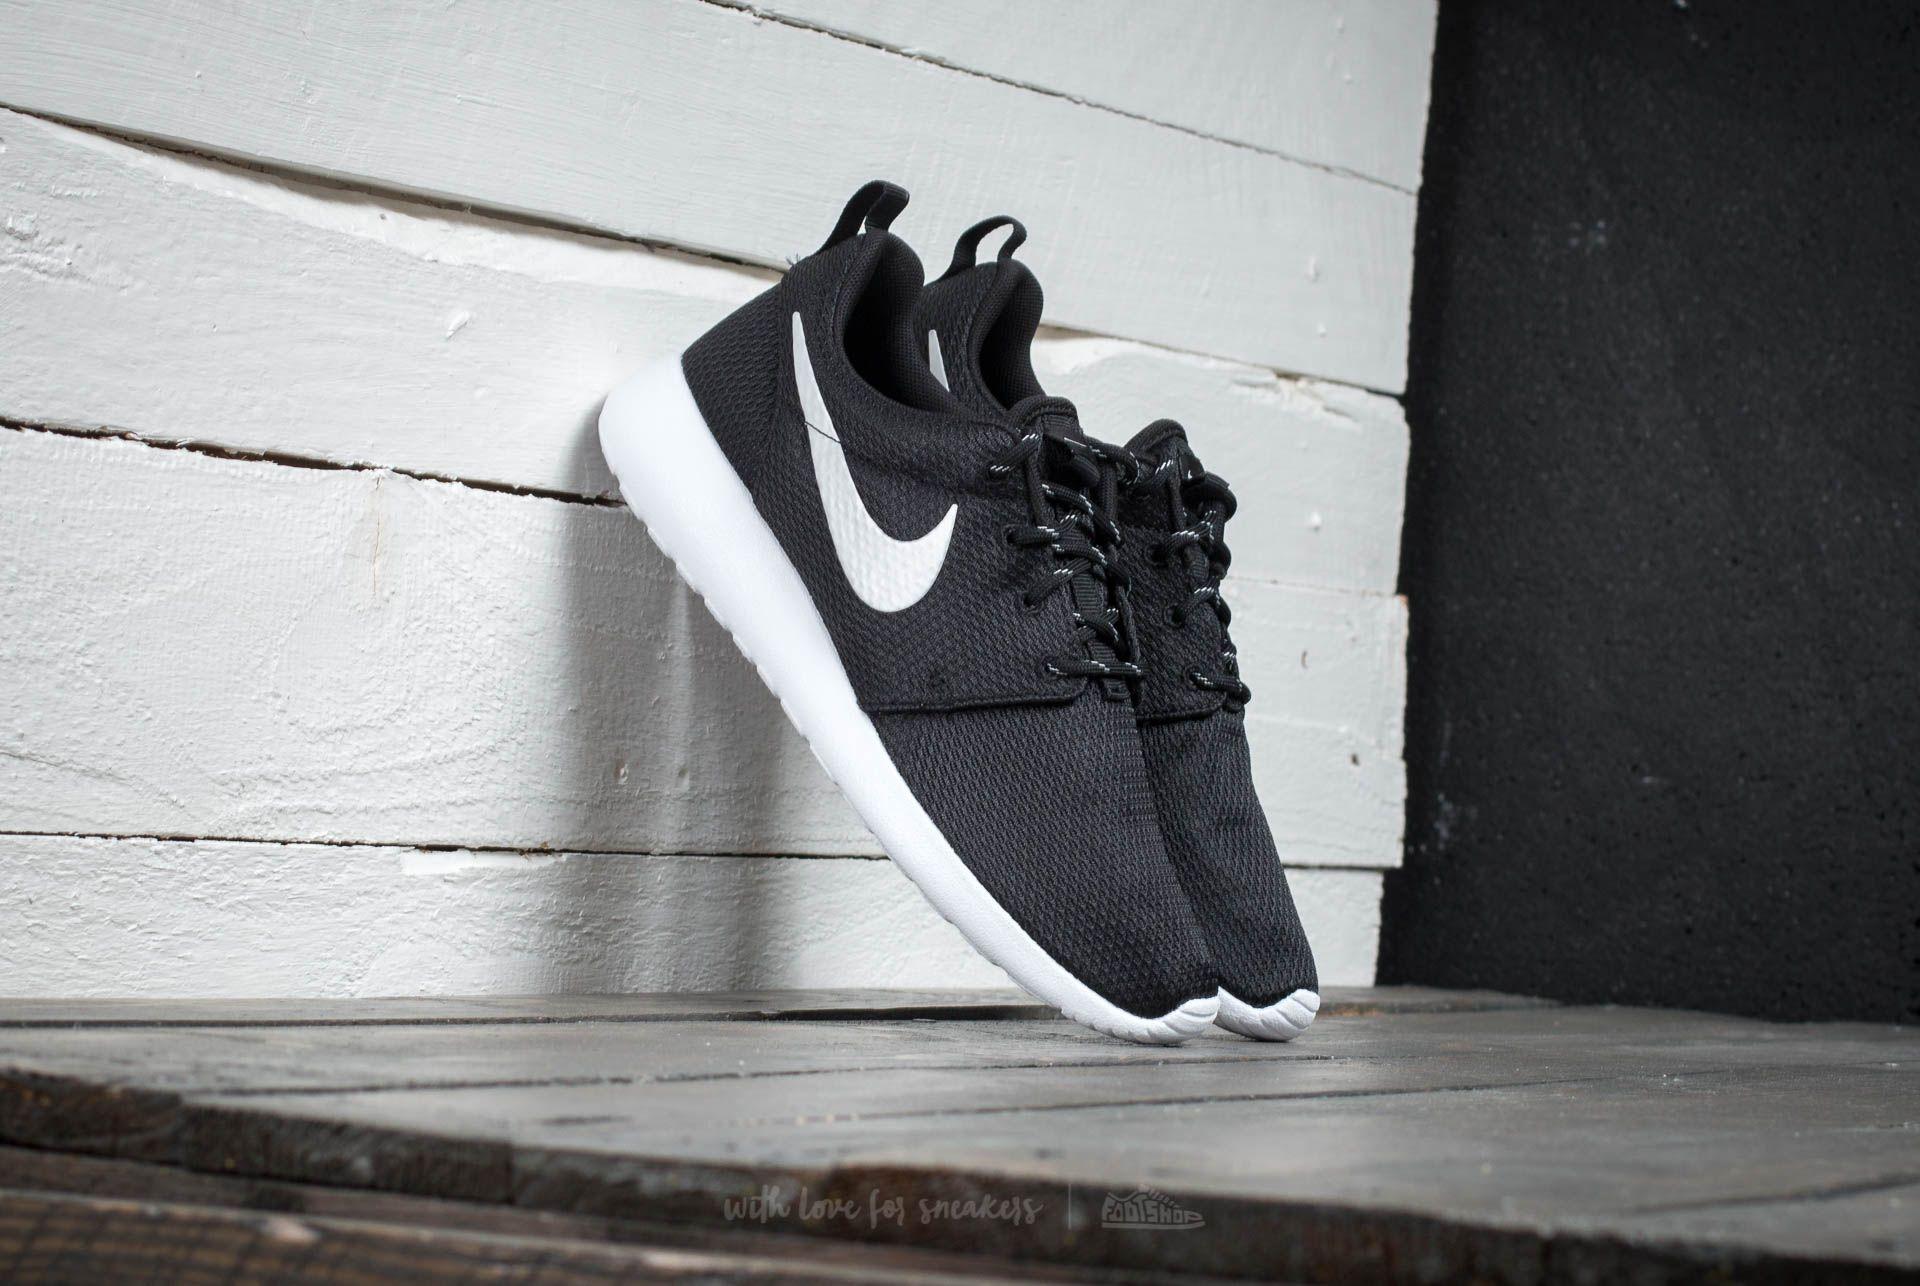 Nike WMNS Rosherun Black/Mettalic Platinum-White